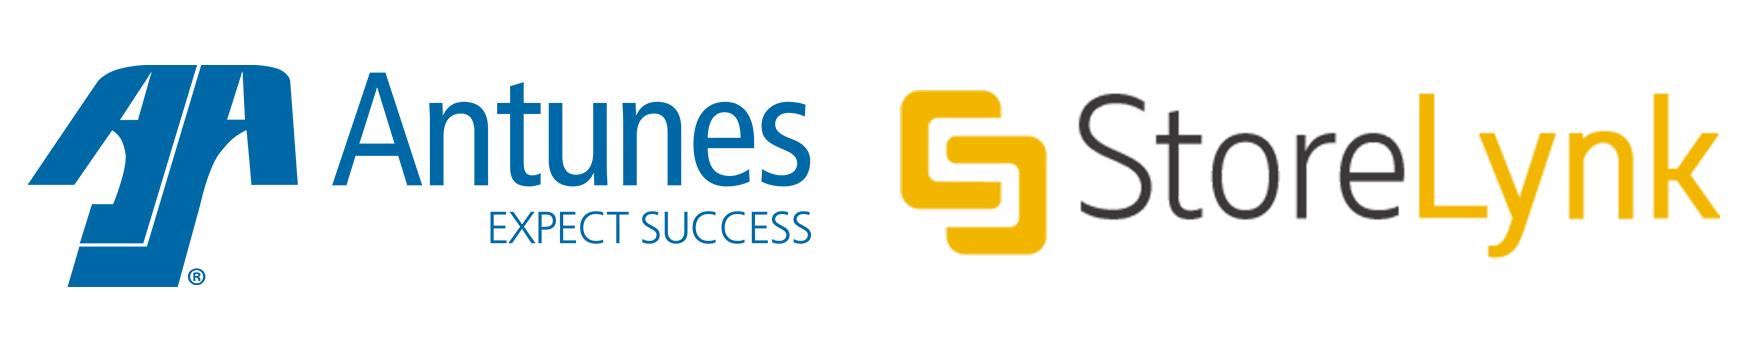 antunes-storelynk logo